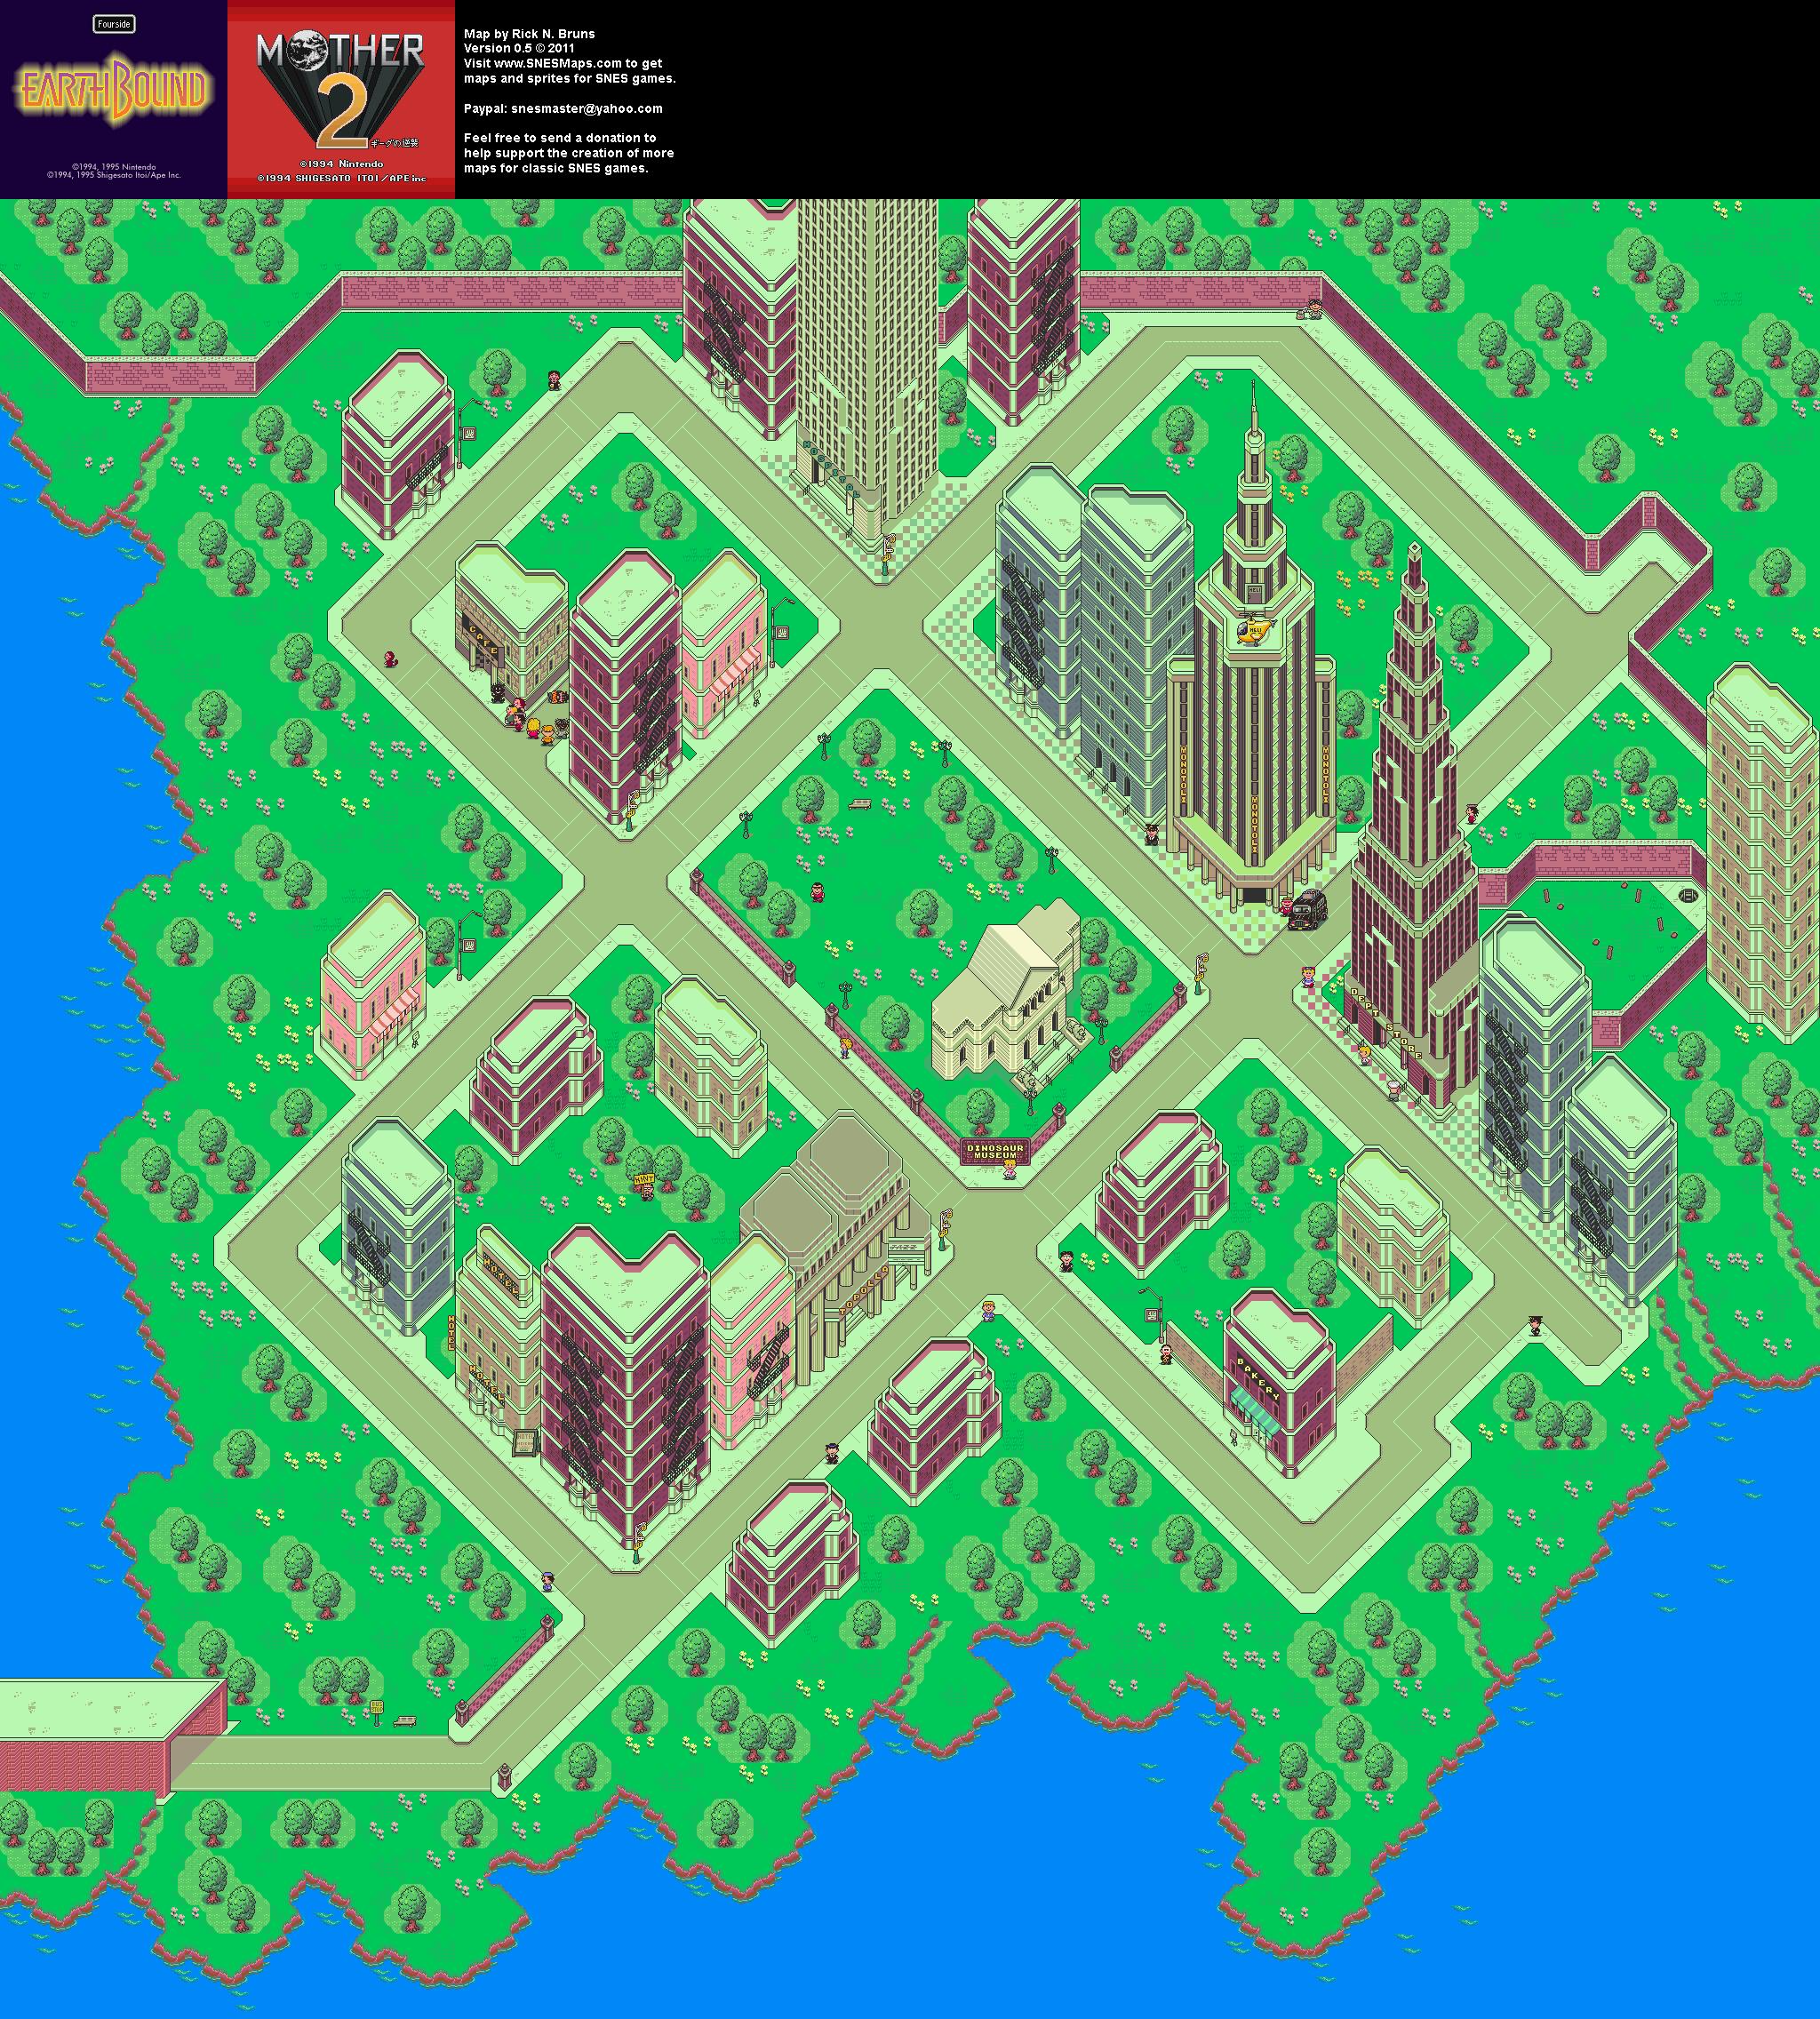 EarthBound (Mother 2) - Fourside Super Nintendo SNES Map